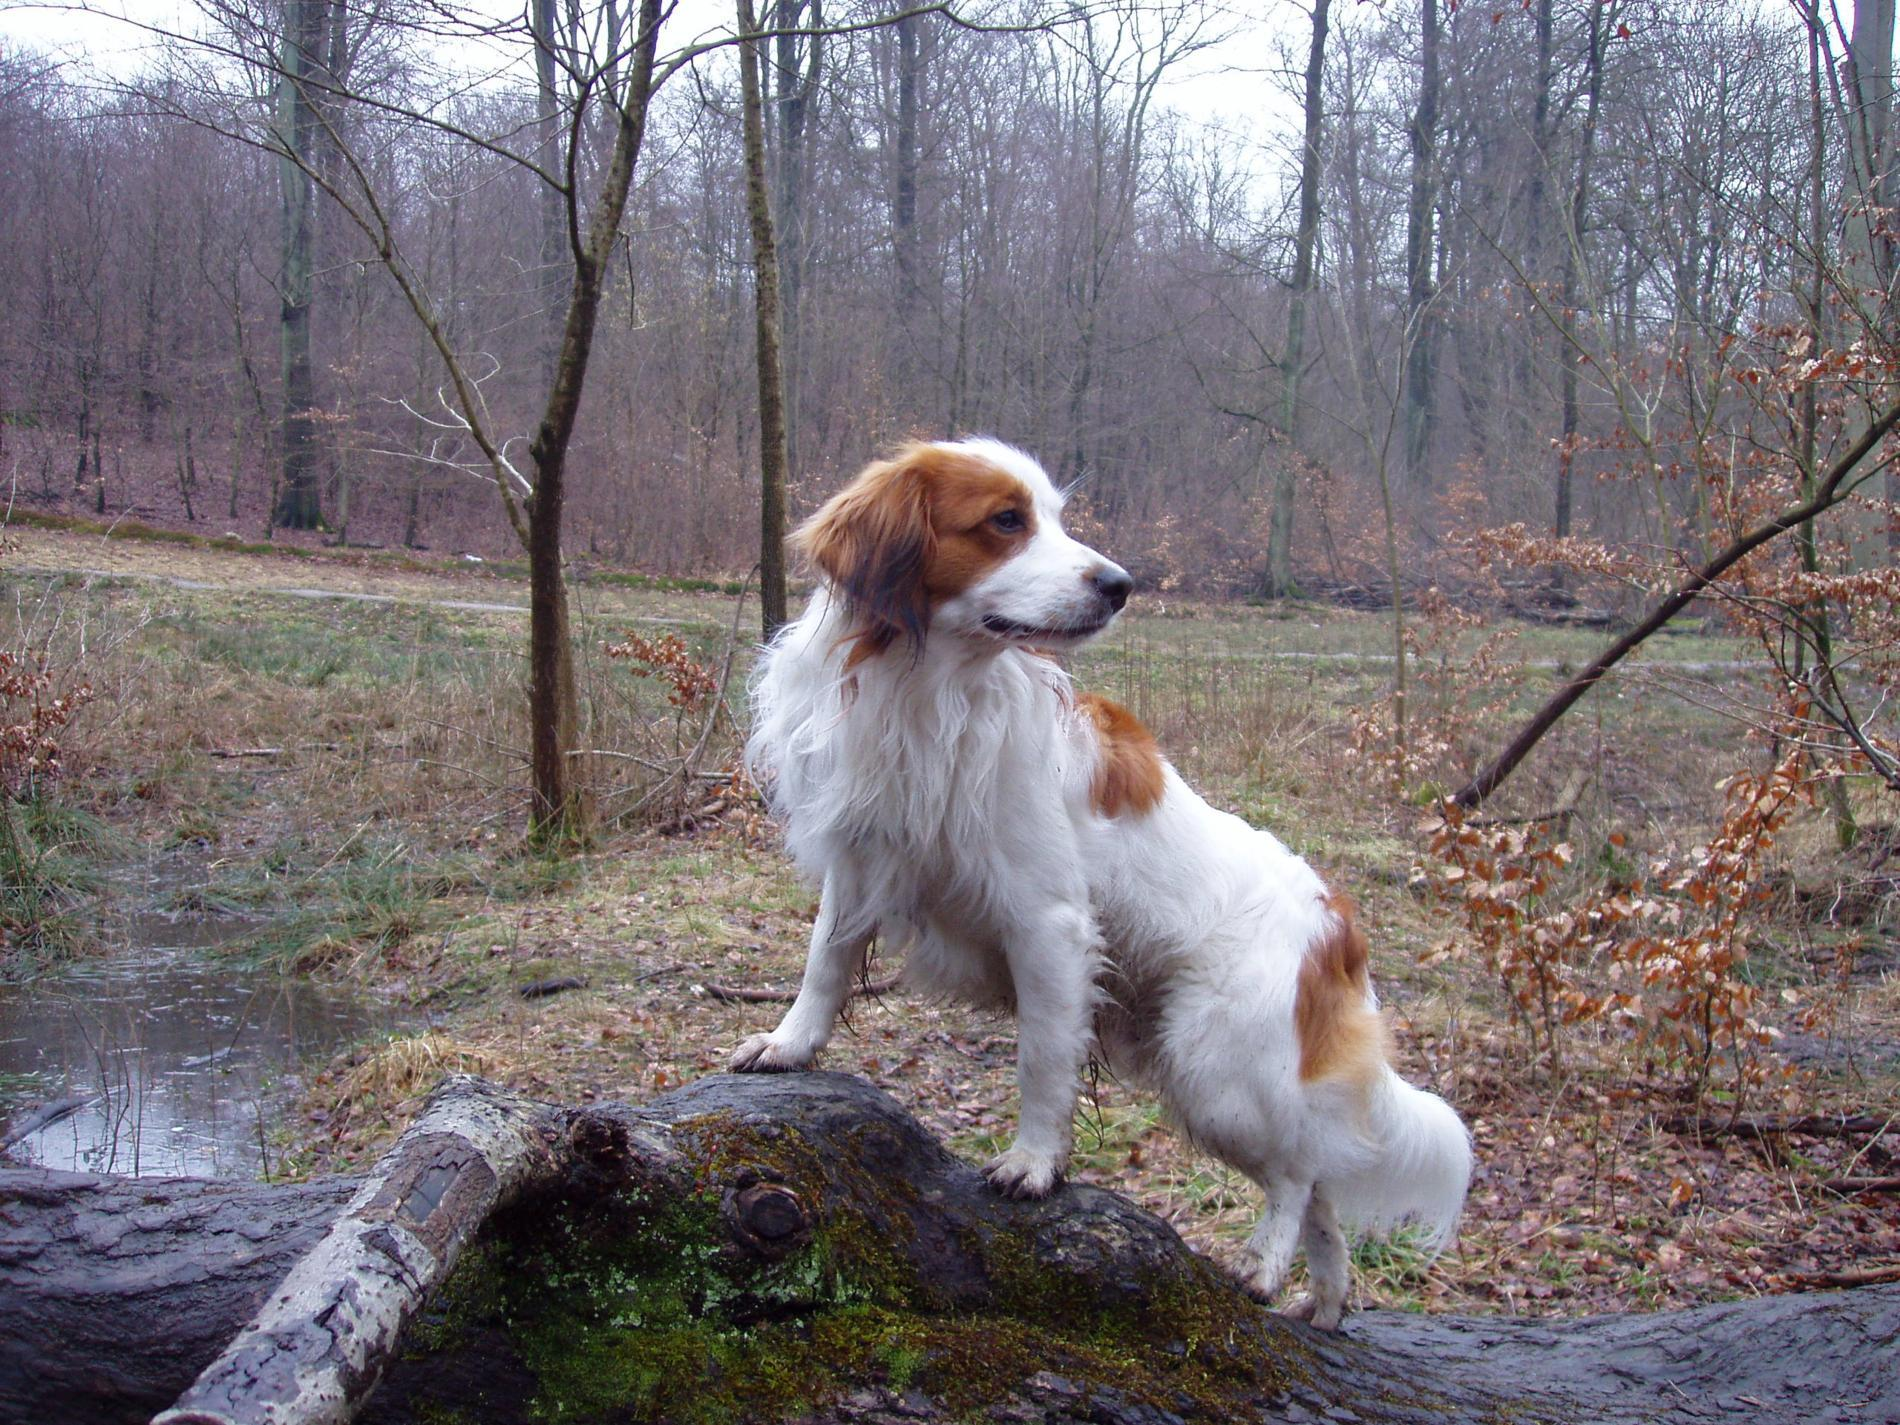 Kooikerhondje dog in the forest wallpaper